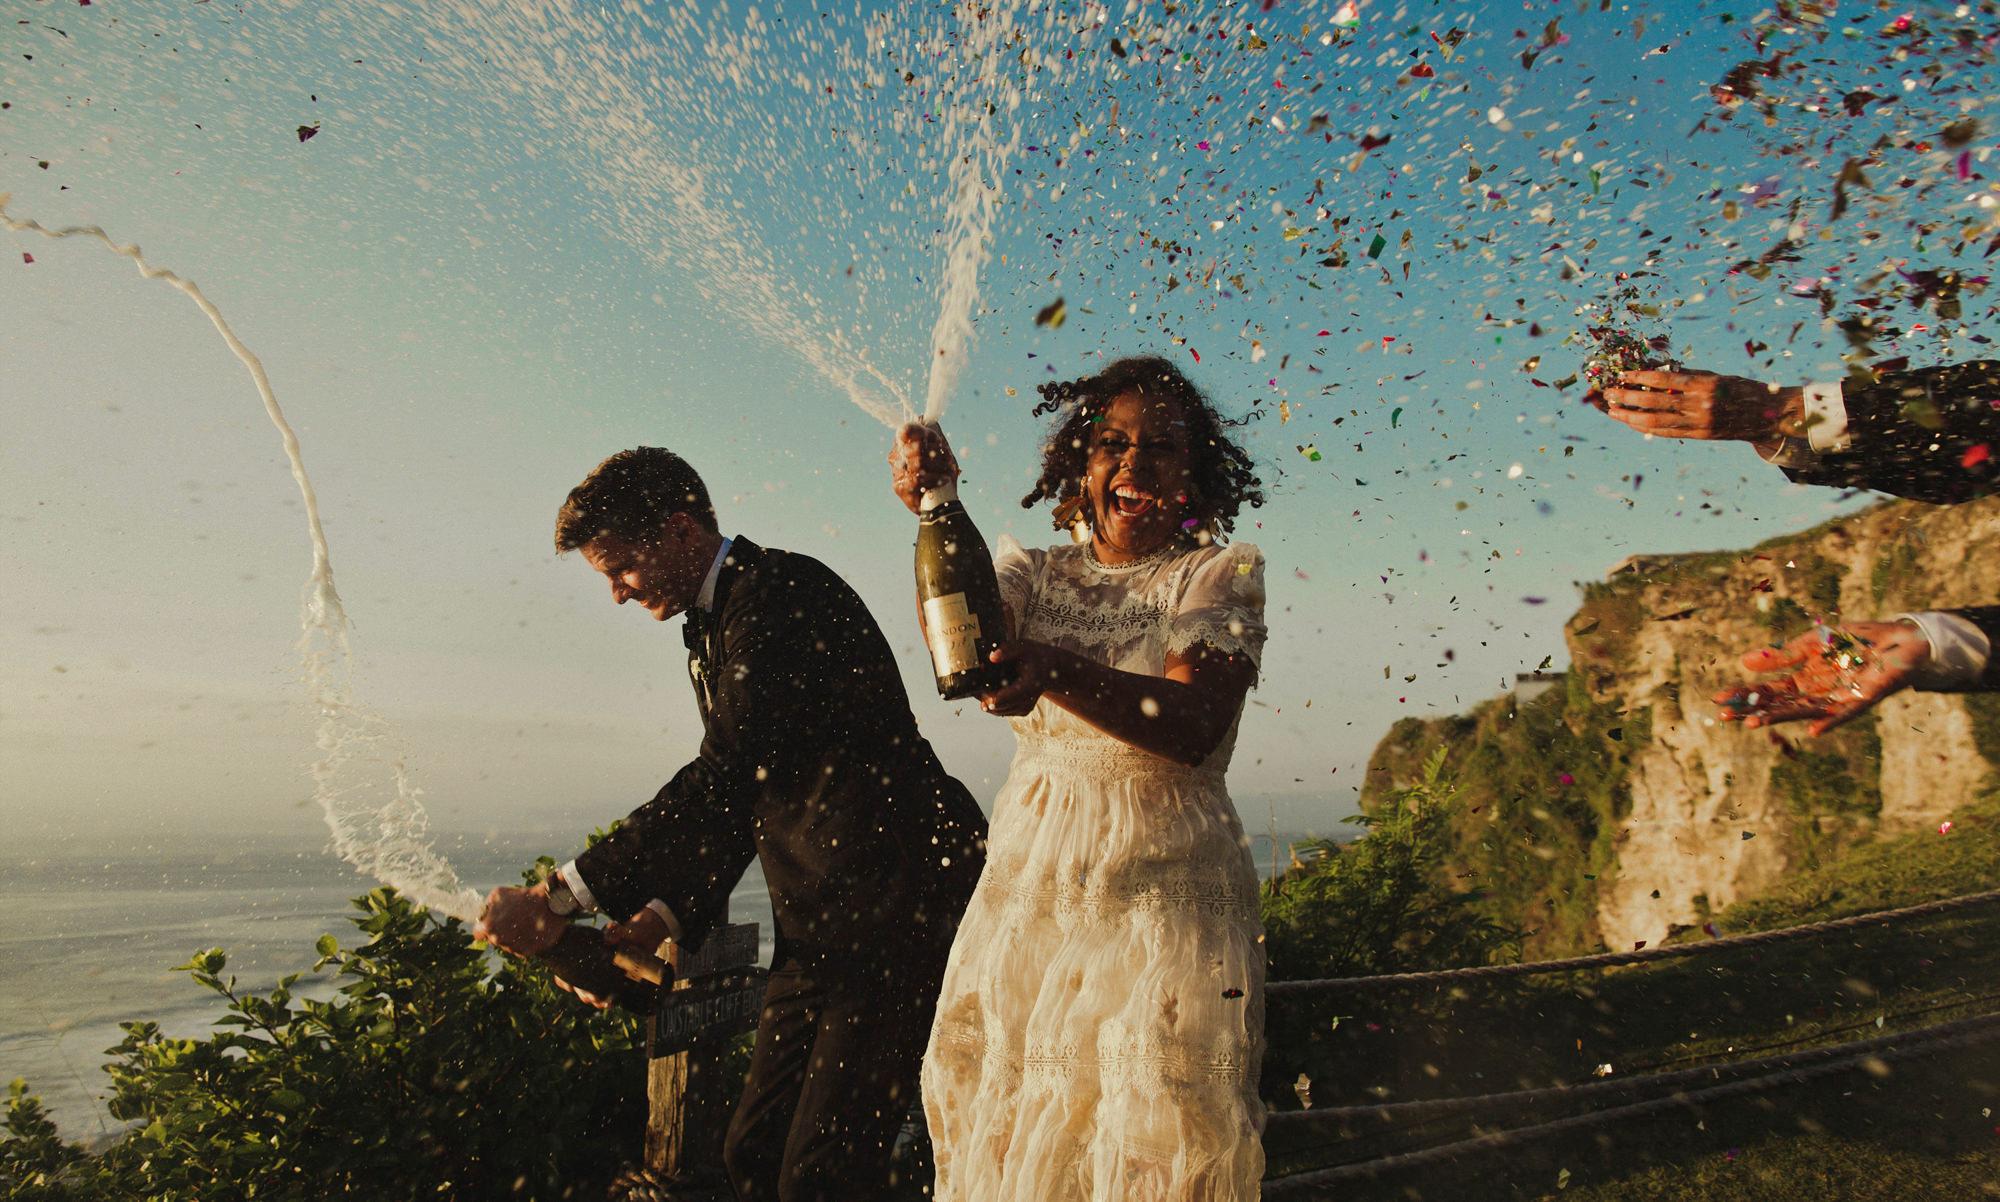 bride-and-groom-pop-champagne-with-confetti-worlds-best-wedding-photos-dan-o-day-australia-wedding-photographer